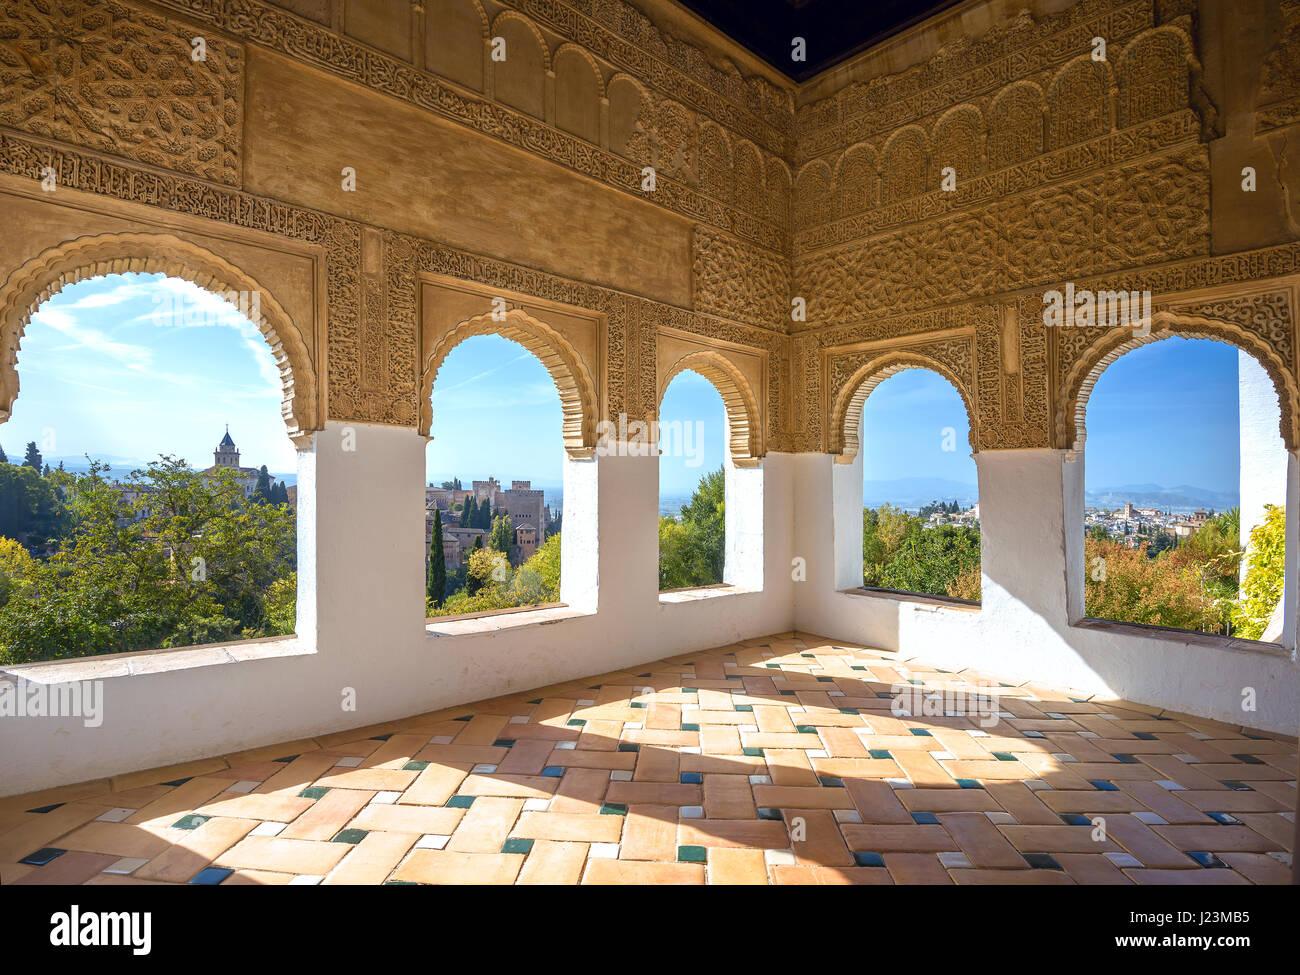 Interior alhambra stock photos interior alhambra stock for Alhambra decoration